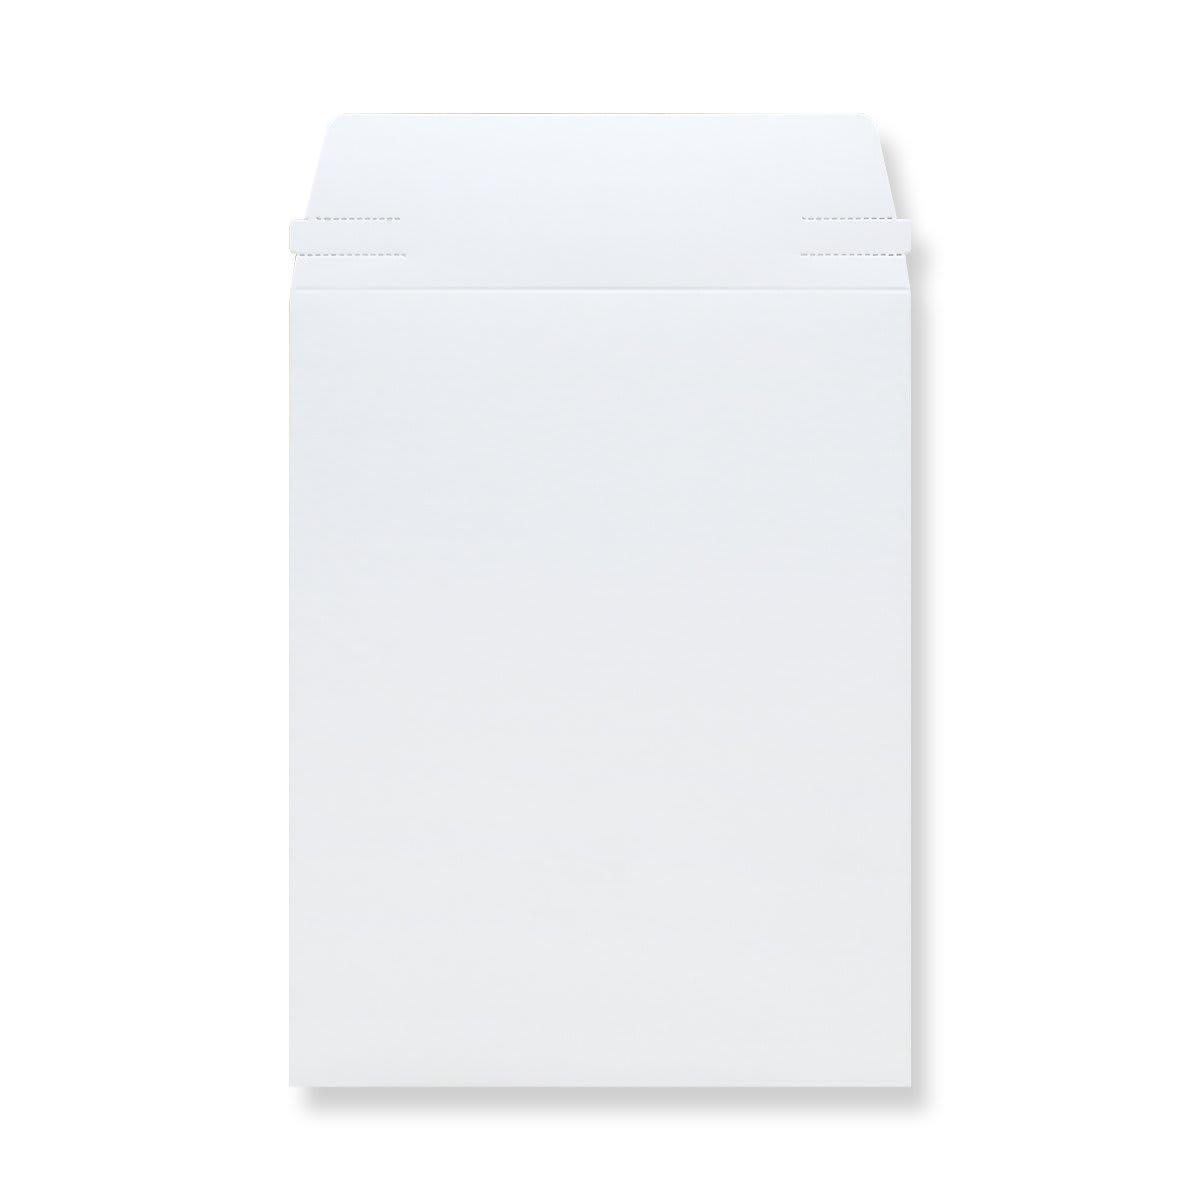 239 x 164mm WHITE ALL BOARD ENVELOPES